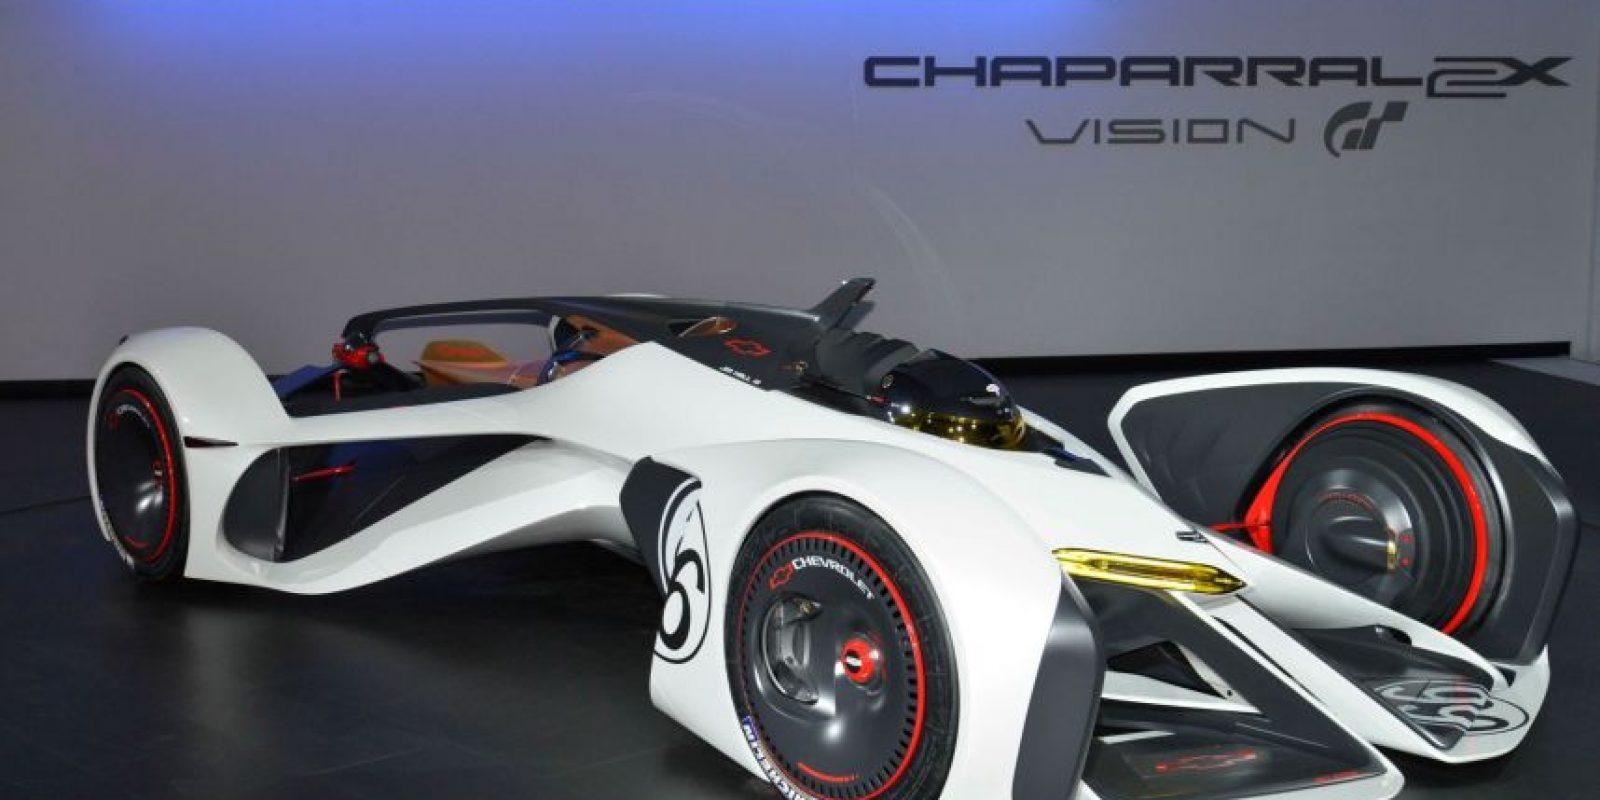 El Chaparral 2X Vision pertenece a Chevrolet. Foto:automobilemag.com